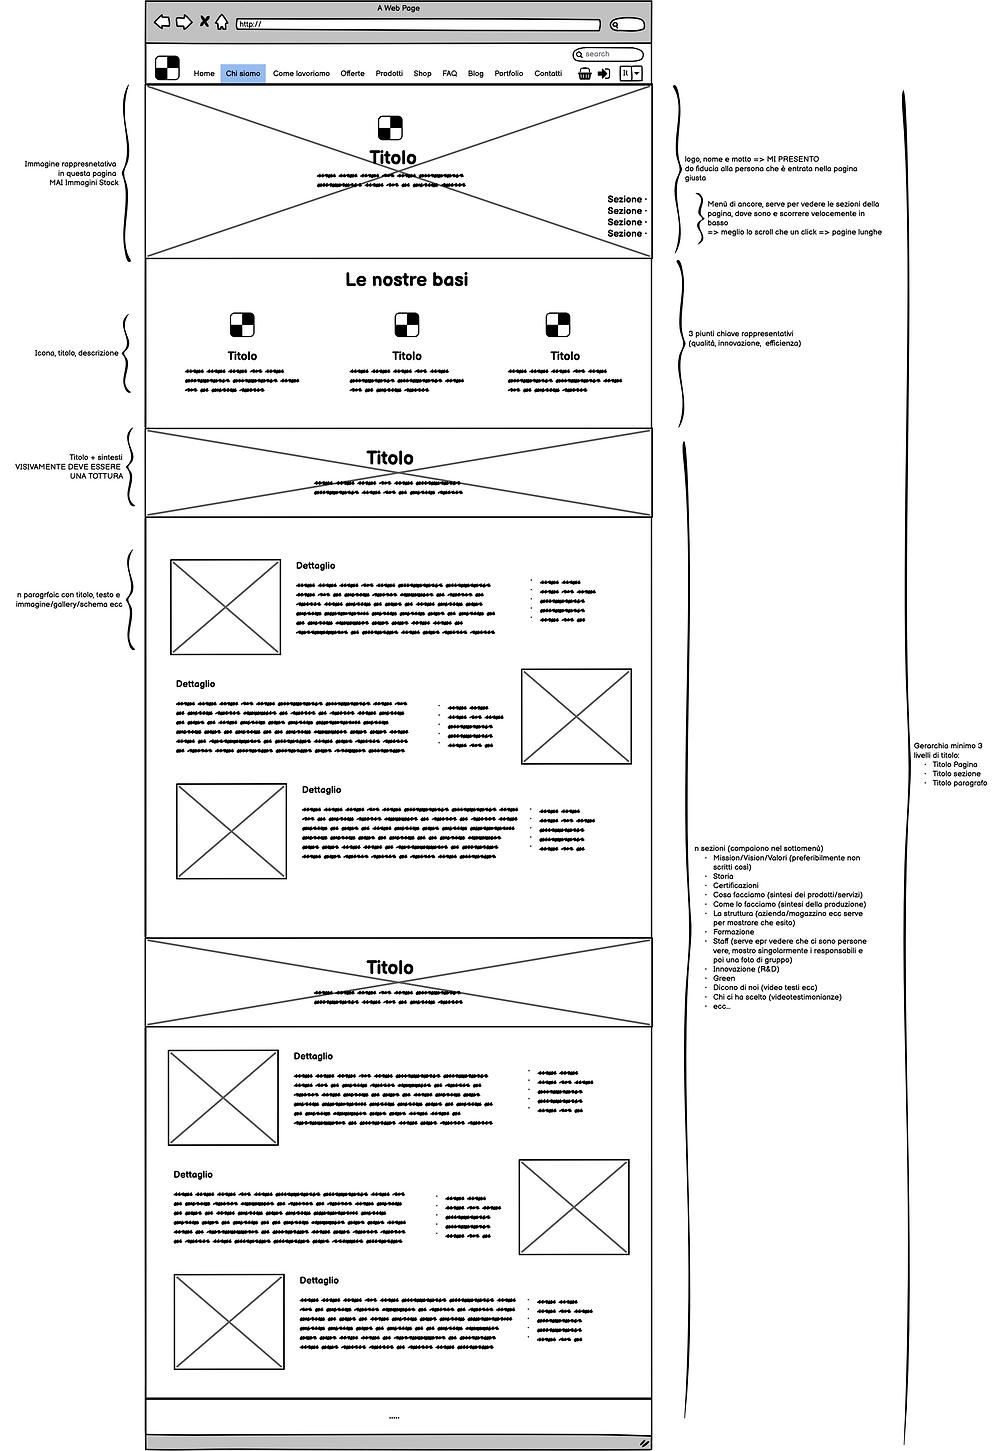 Schema pagina chi siamo - Web design - Wix, Wordpress, Magento, Prestashop